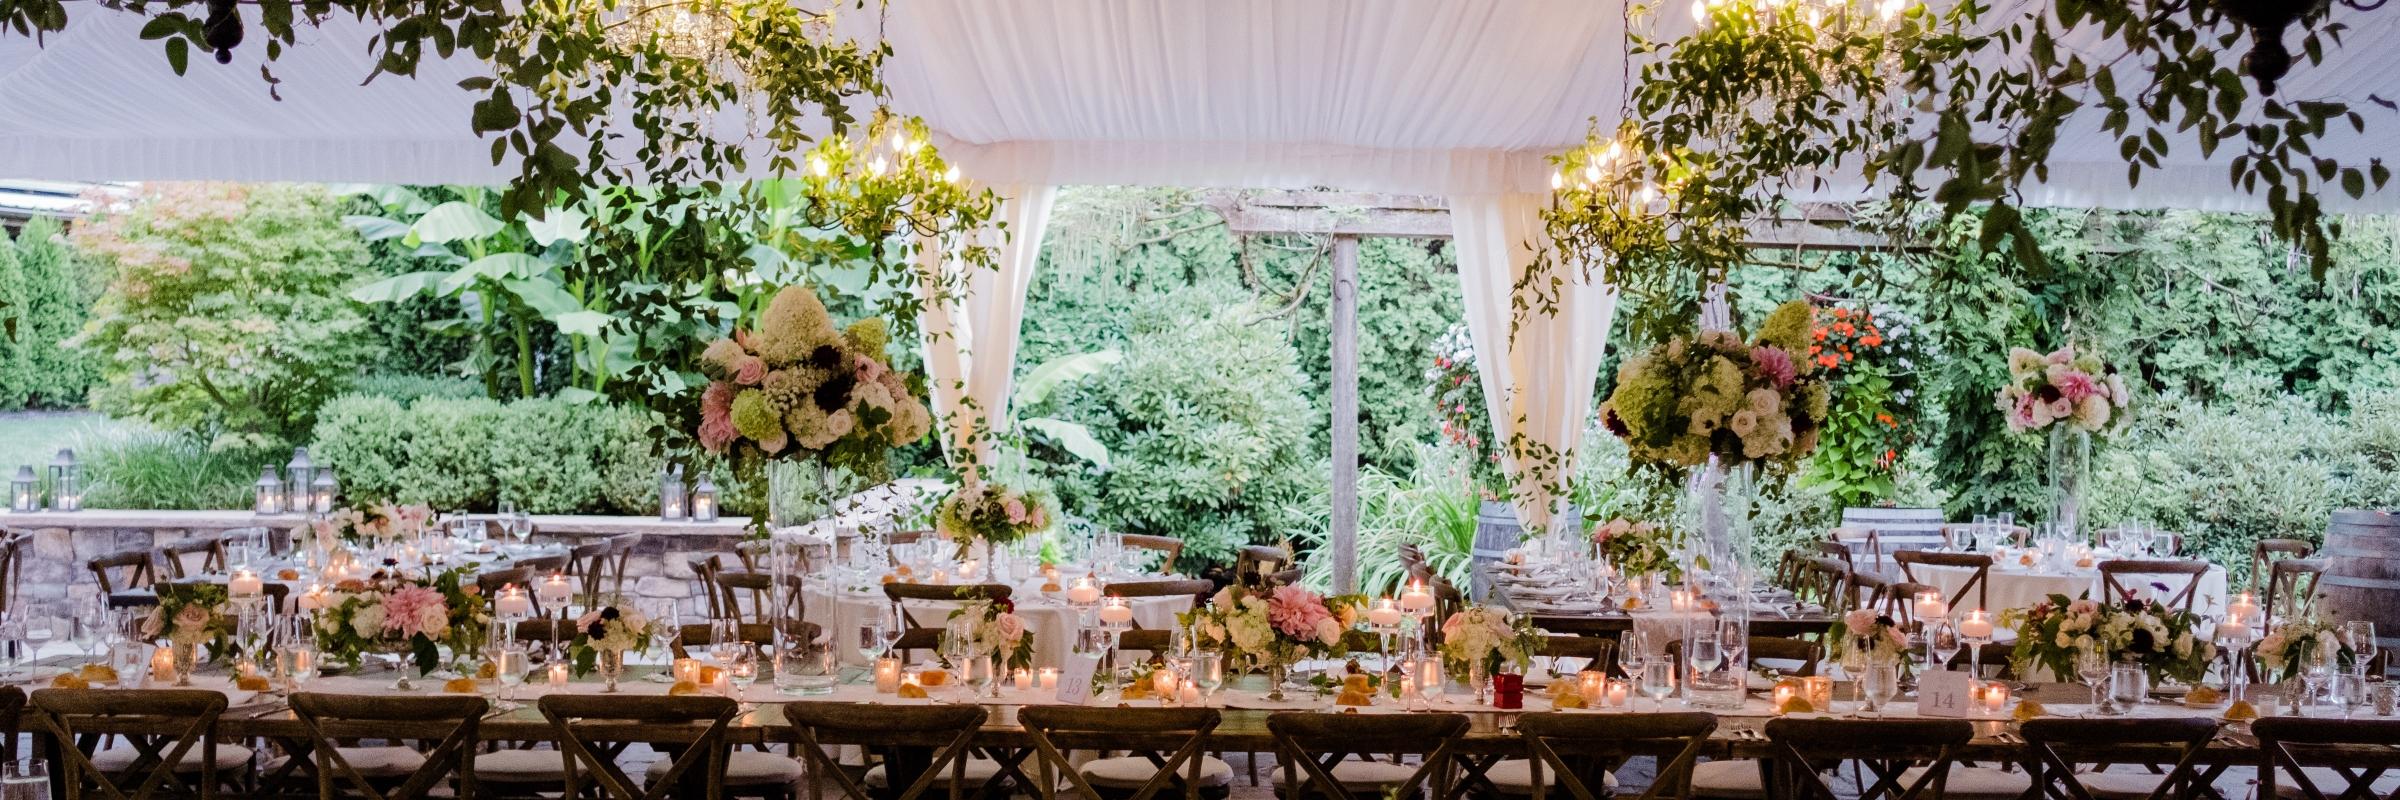 Seattle Portland Wedding Planner Perfectly Posh Events